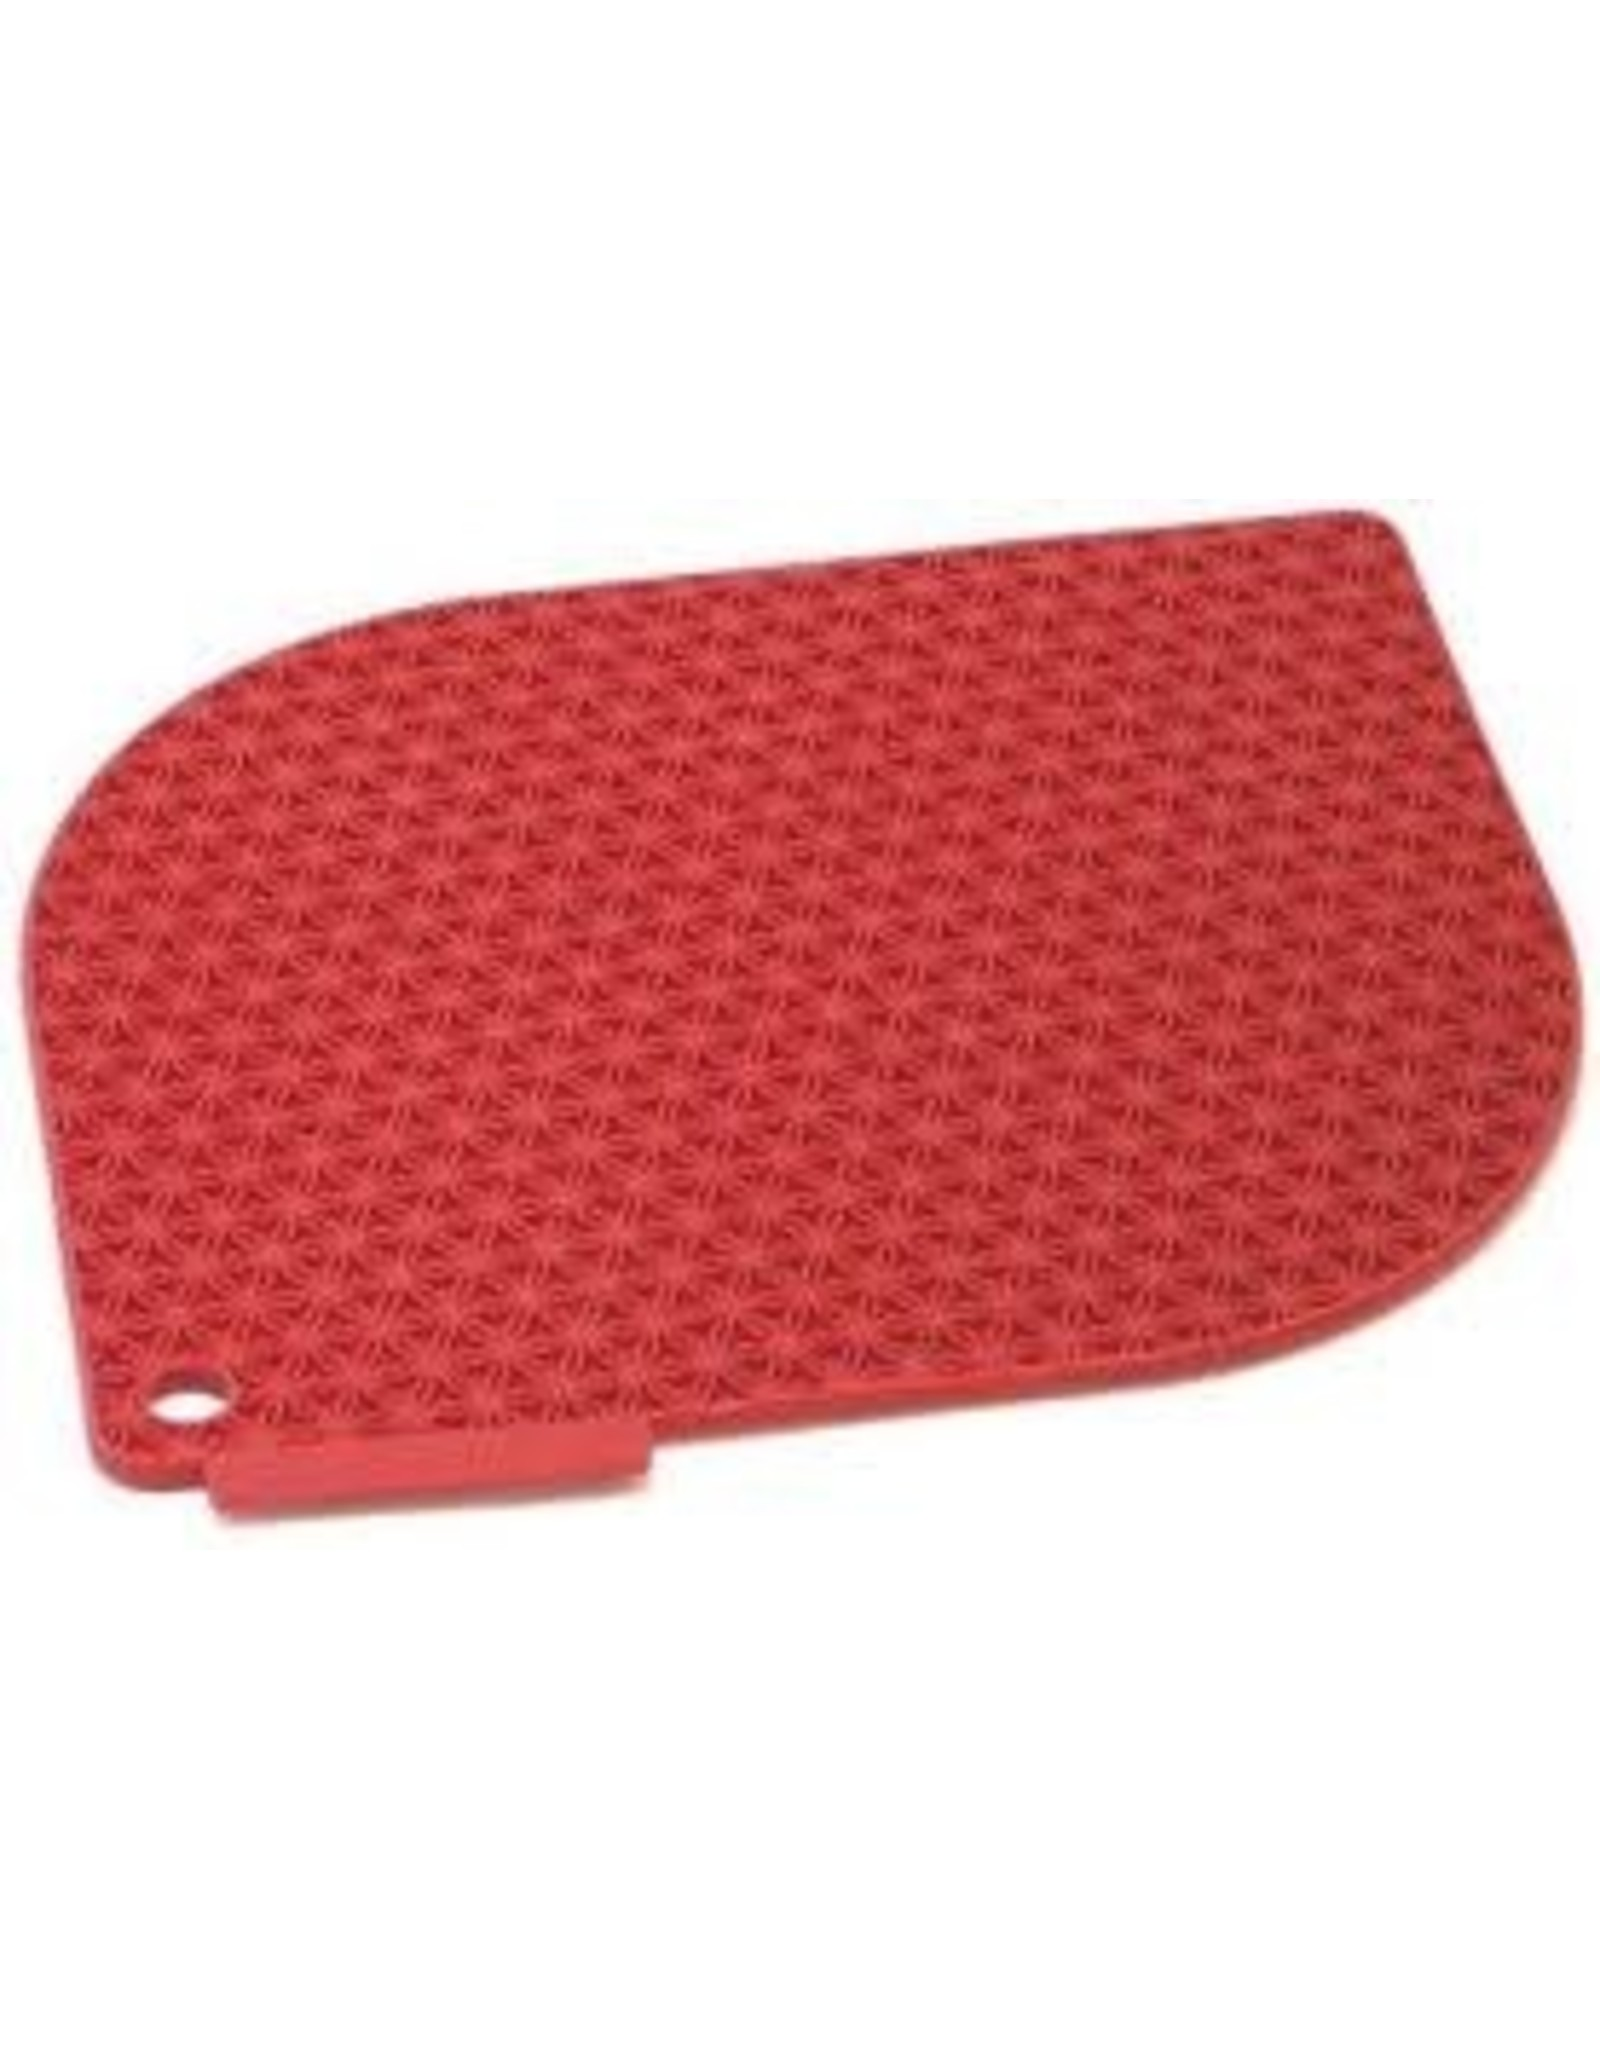 Honeycomb Pot Holder- Red